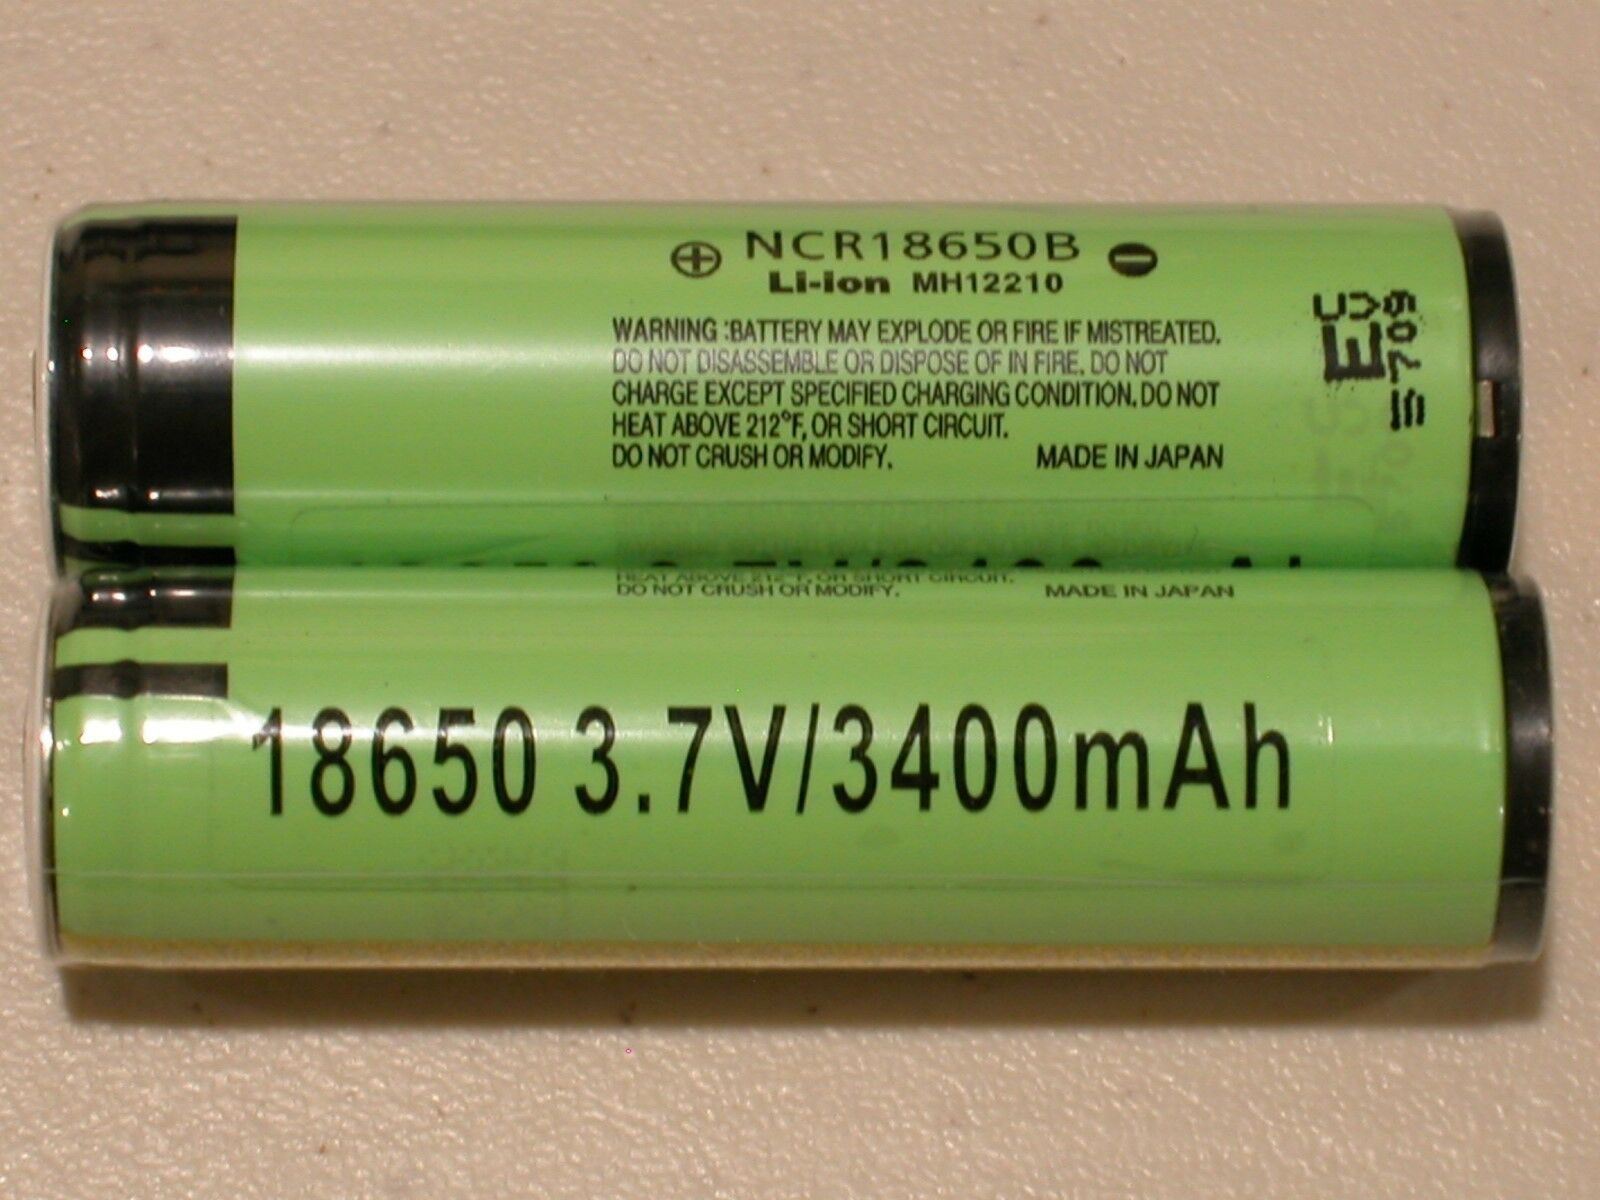 4 Panasonic Ncr18650b Li-ion Battery 3400mah 3.7v 18650 P...